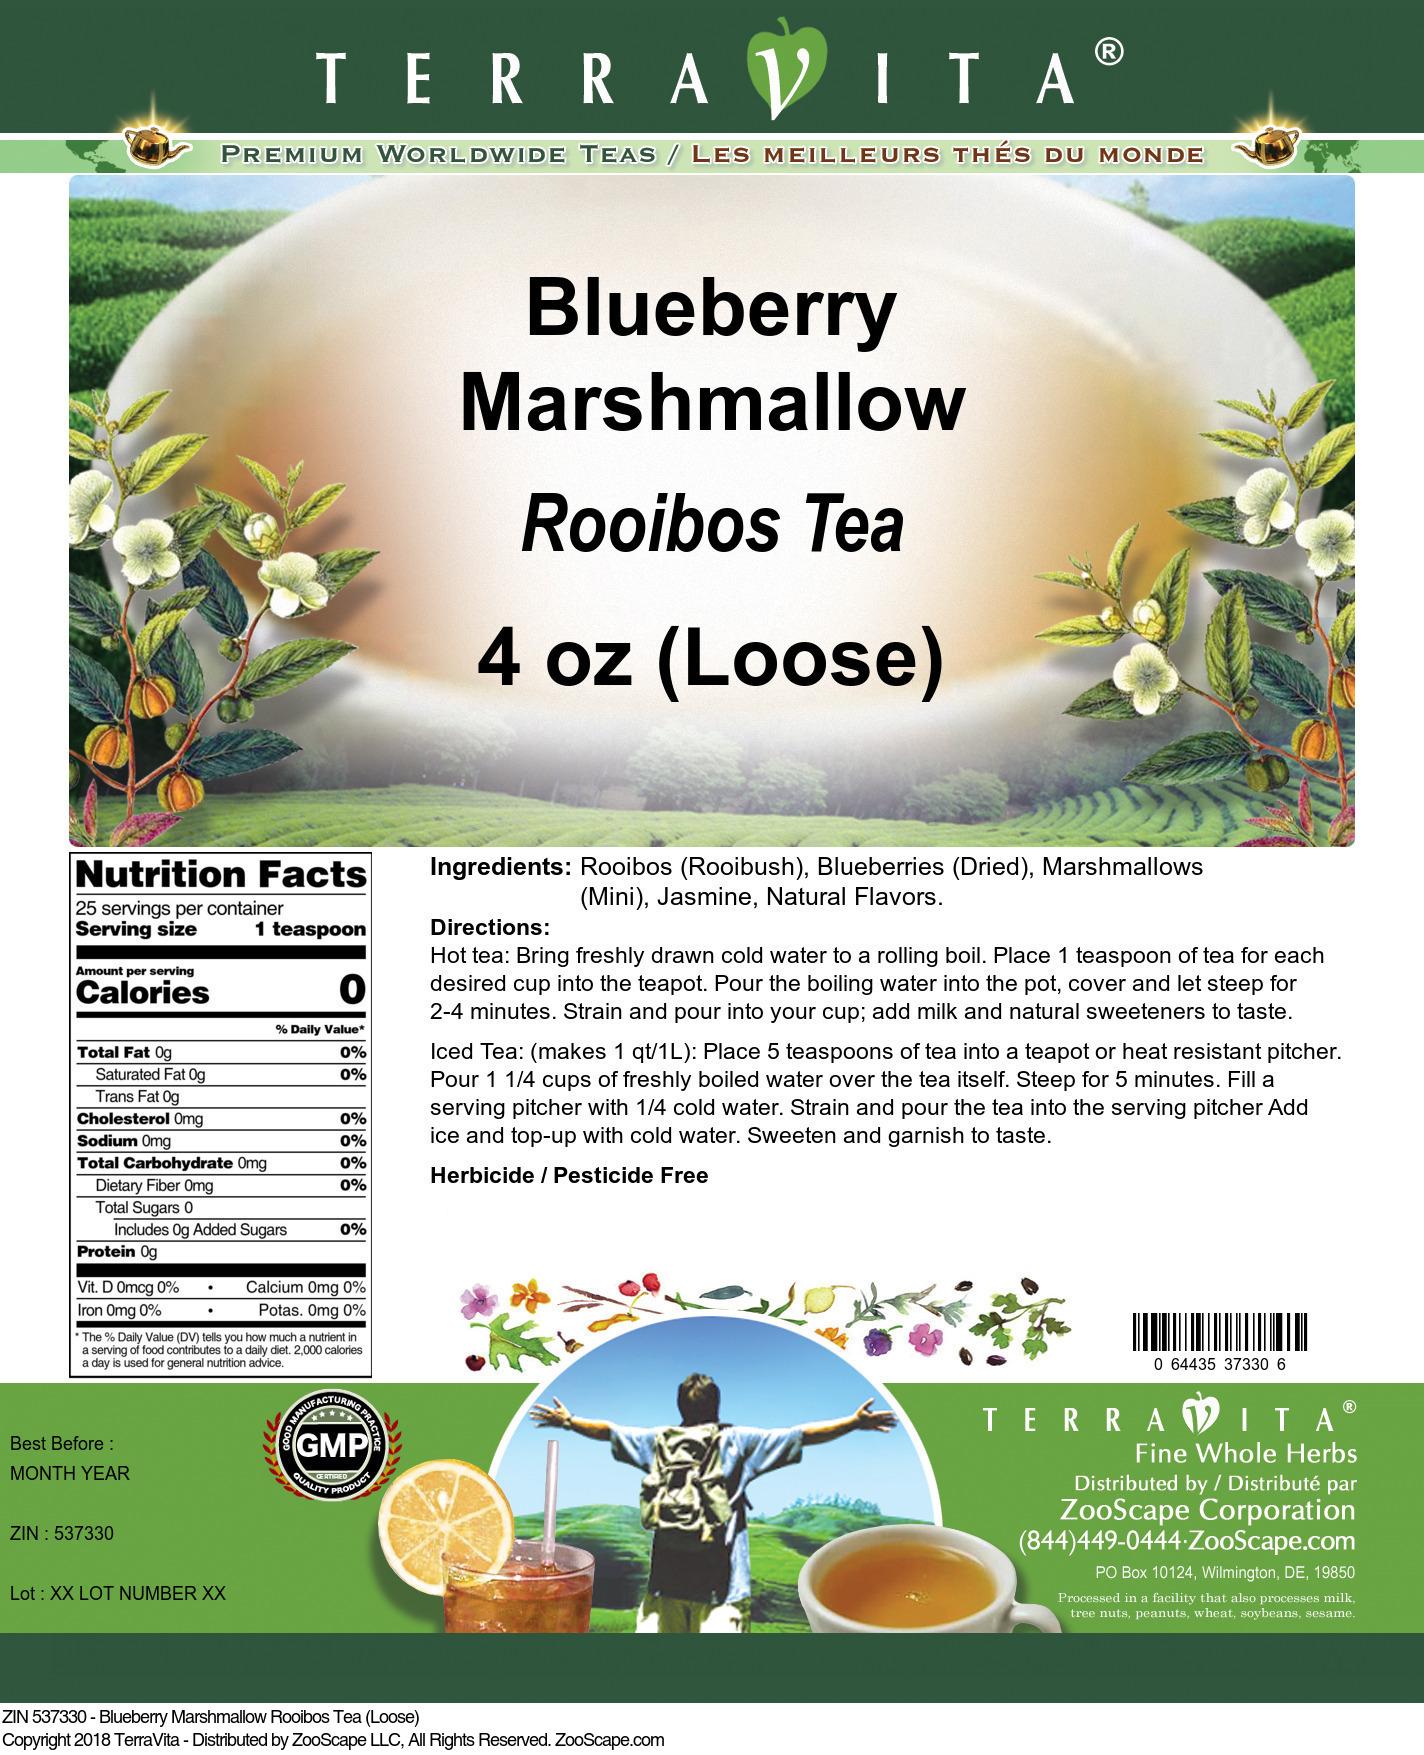 Blueberry Marshmallow Rooibos Tea (Loose)